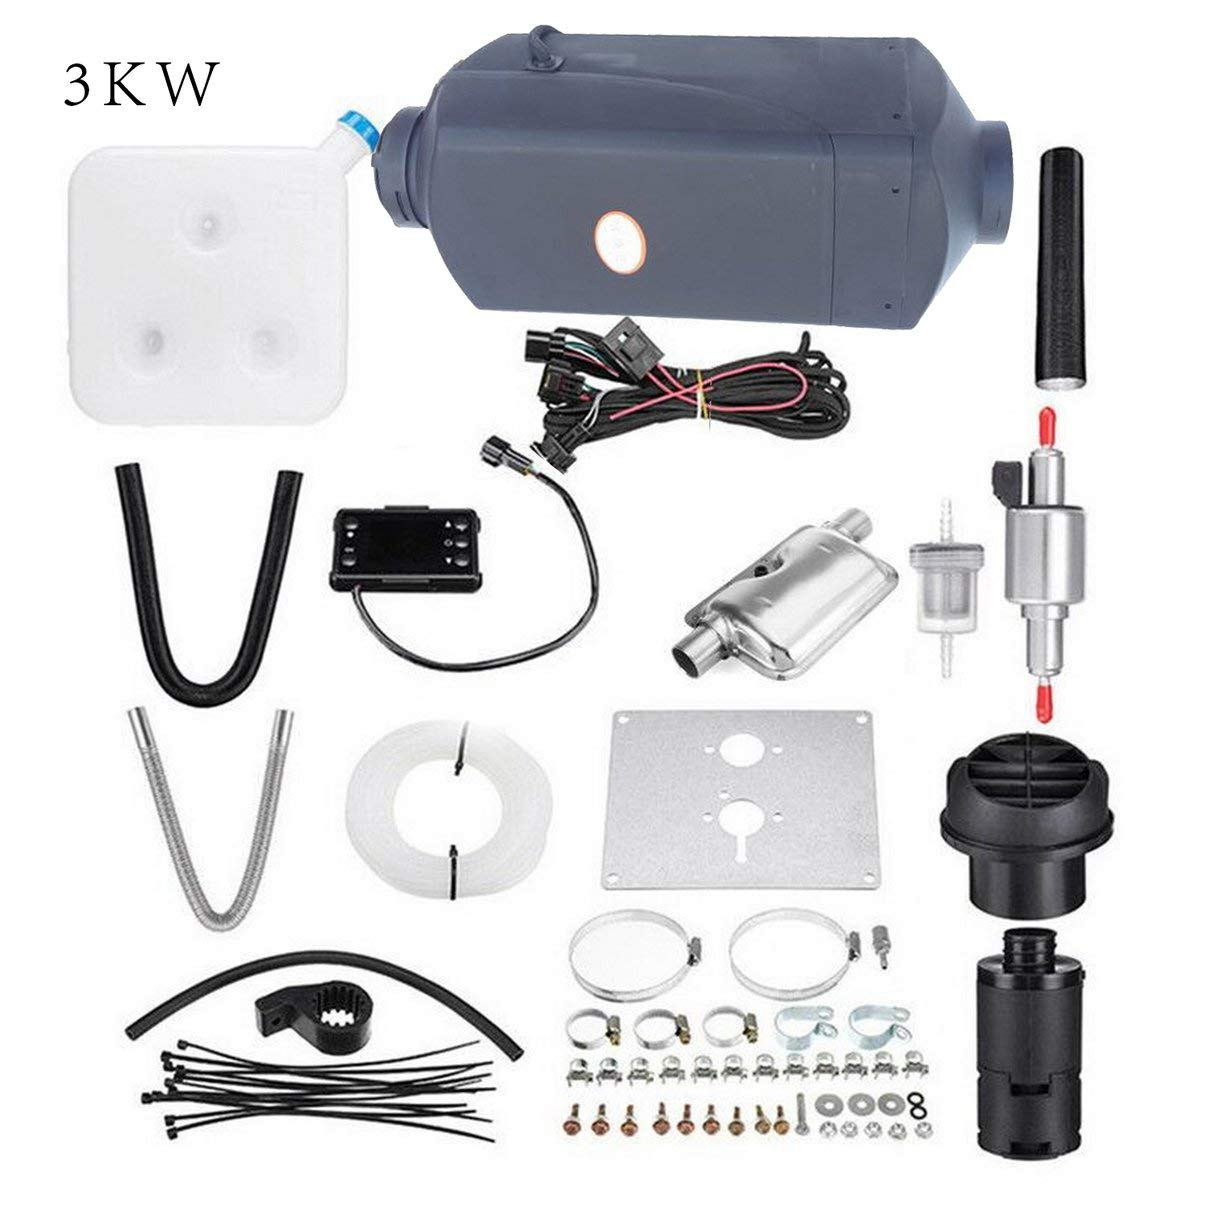 silenziatore Serbatoio riscaldatore aria diesel-nero Riscaldatore diesel aria 3KW 12V planare LCD per autocarri Barche camper-case